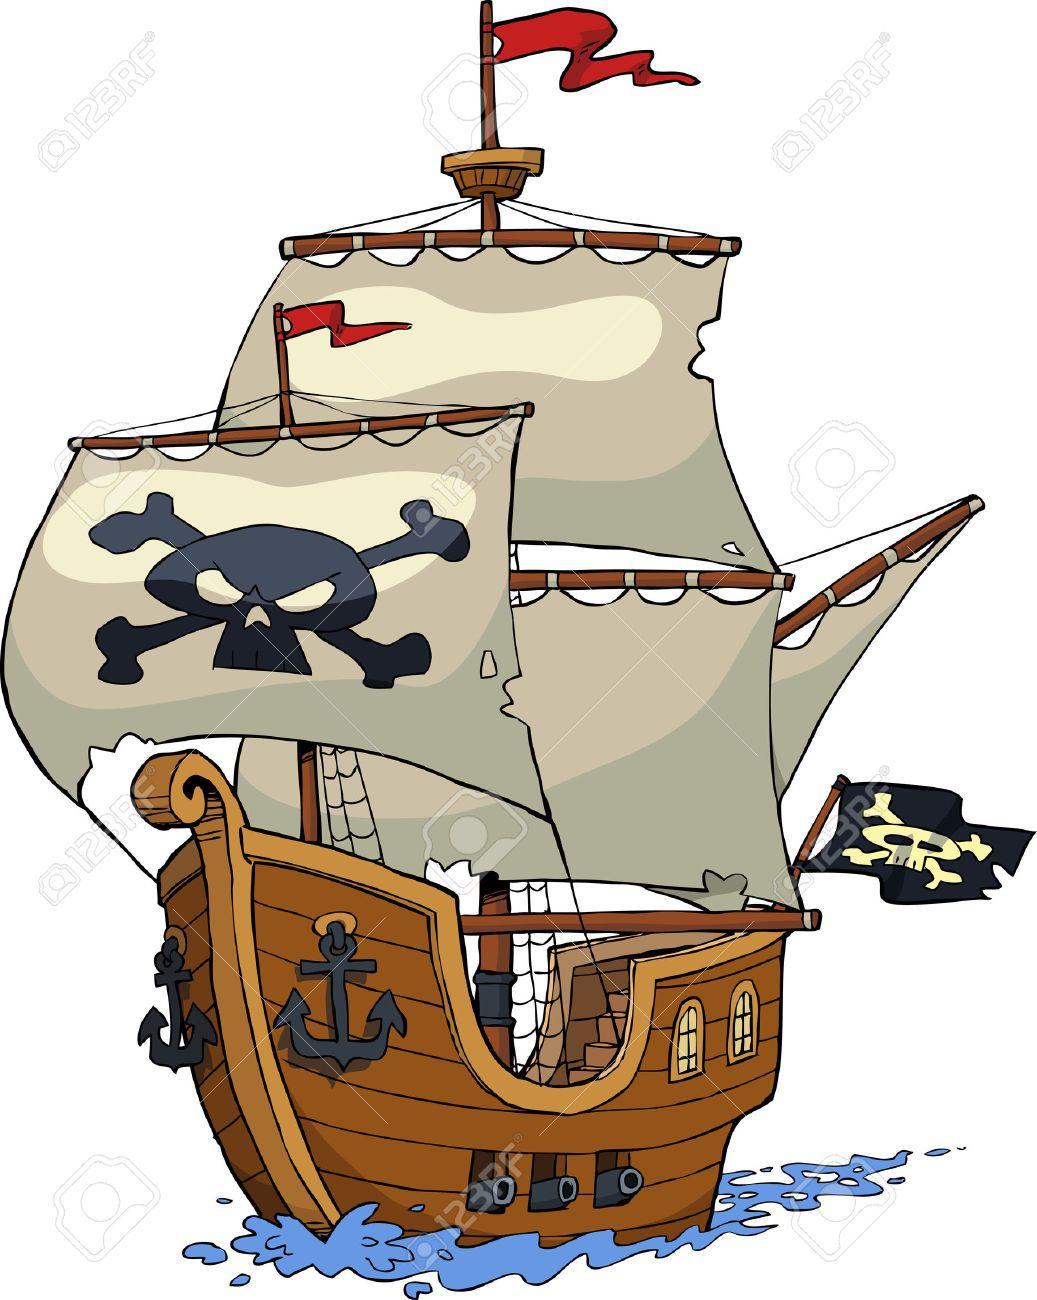 11 Cartoon Pirate ships ideas   cartoon pirate ship, pirates, pirate ship